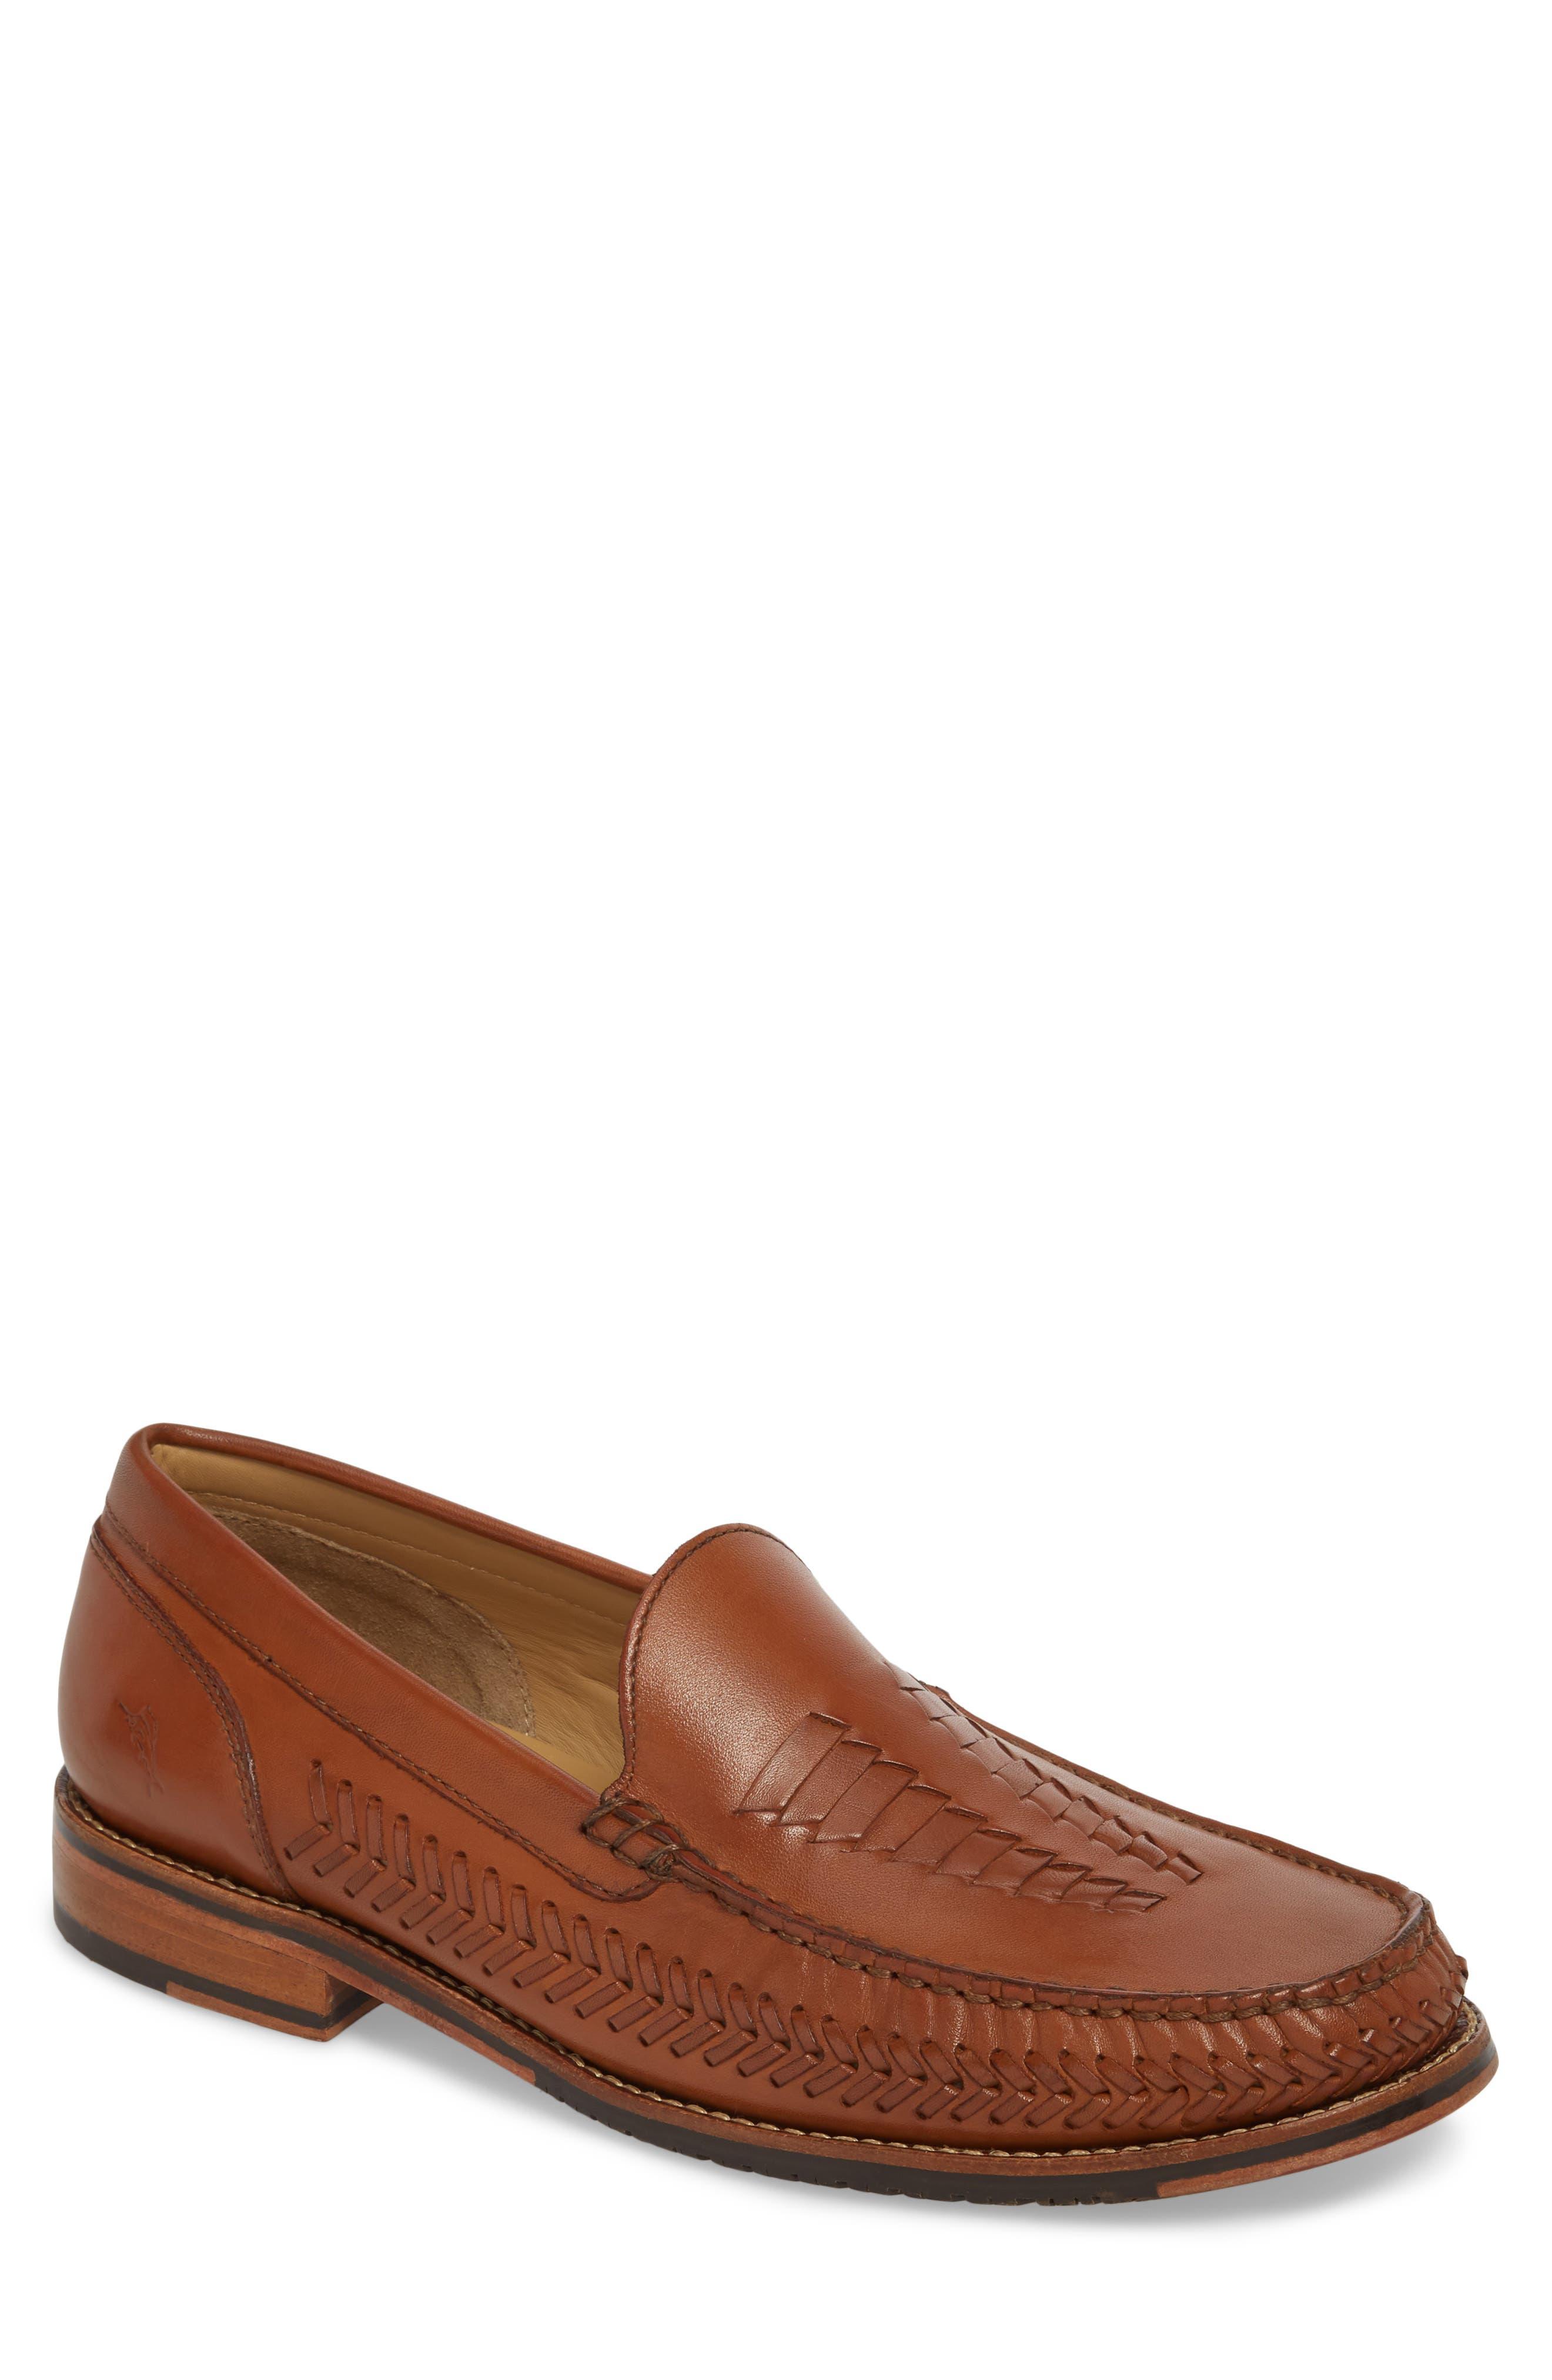 Hasslington Woven Venetian Loafer,                             Main thumbnail 1, color,                             Tan Leather